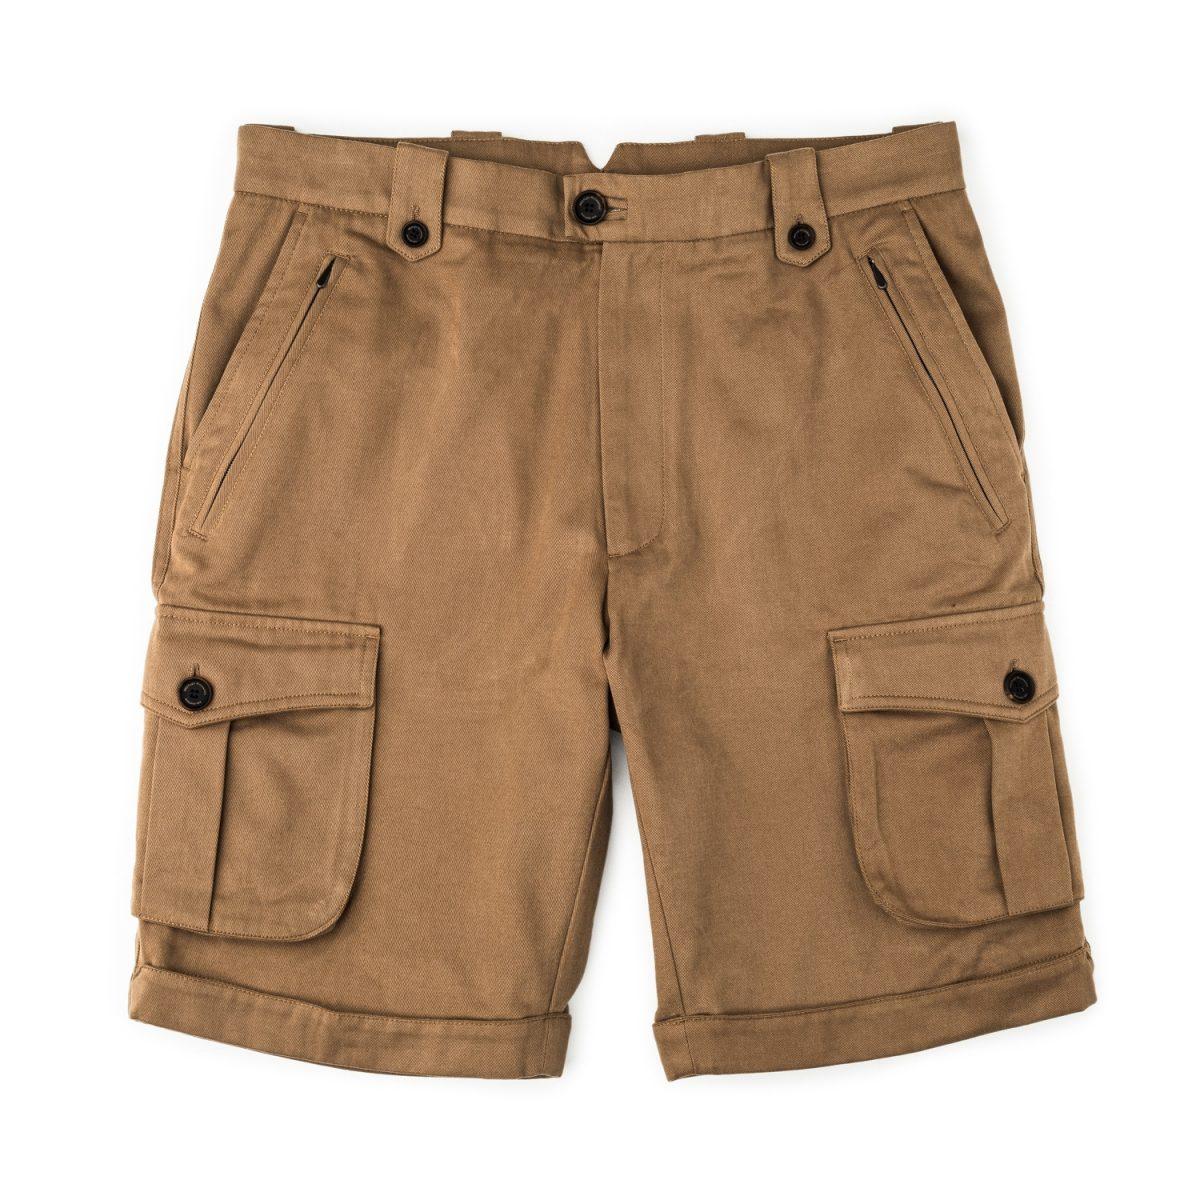 wr_new_safari_shorts_trousers-3349-edit_1